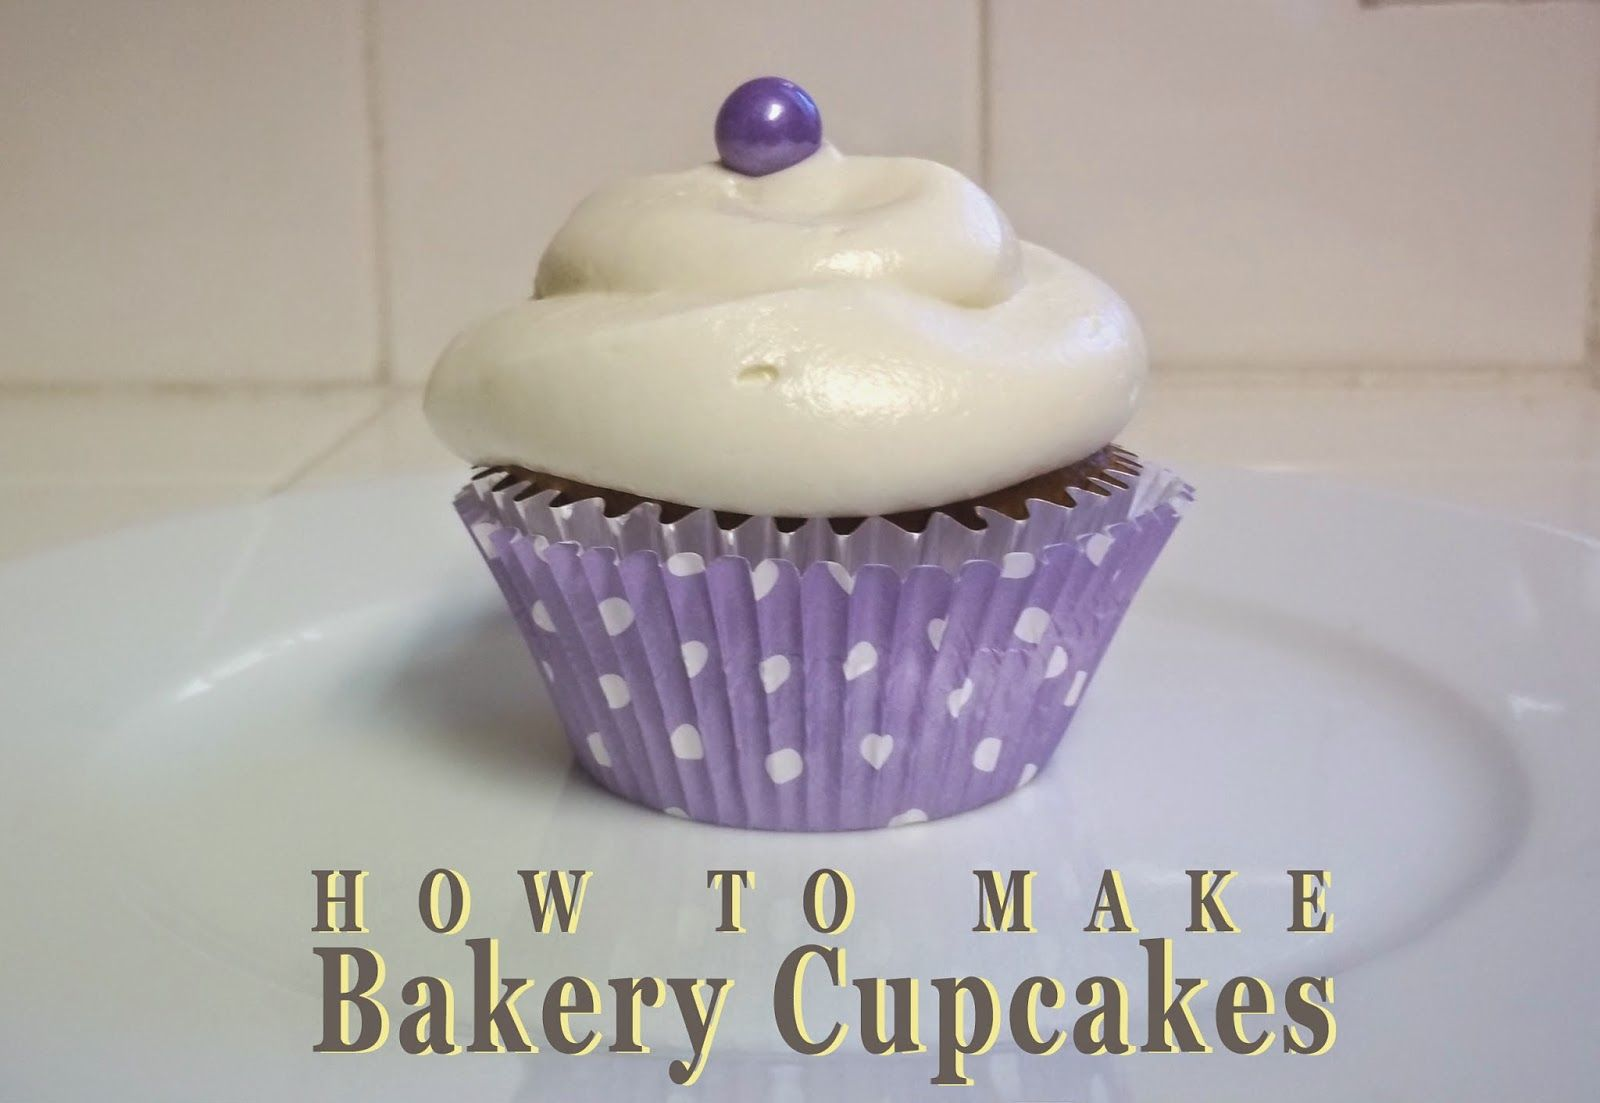 Cake Mix Recipes That Taste Like Bakery: Make A Box Cake Mix Taste Like It Came From A Bakery, And